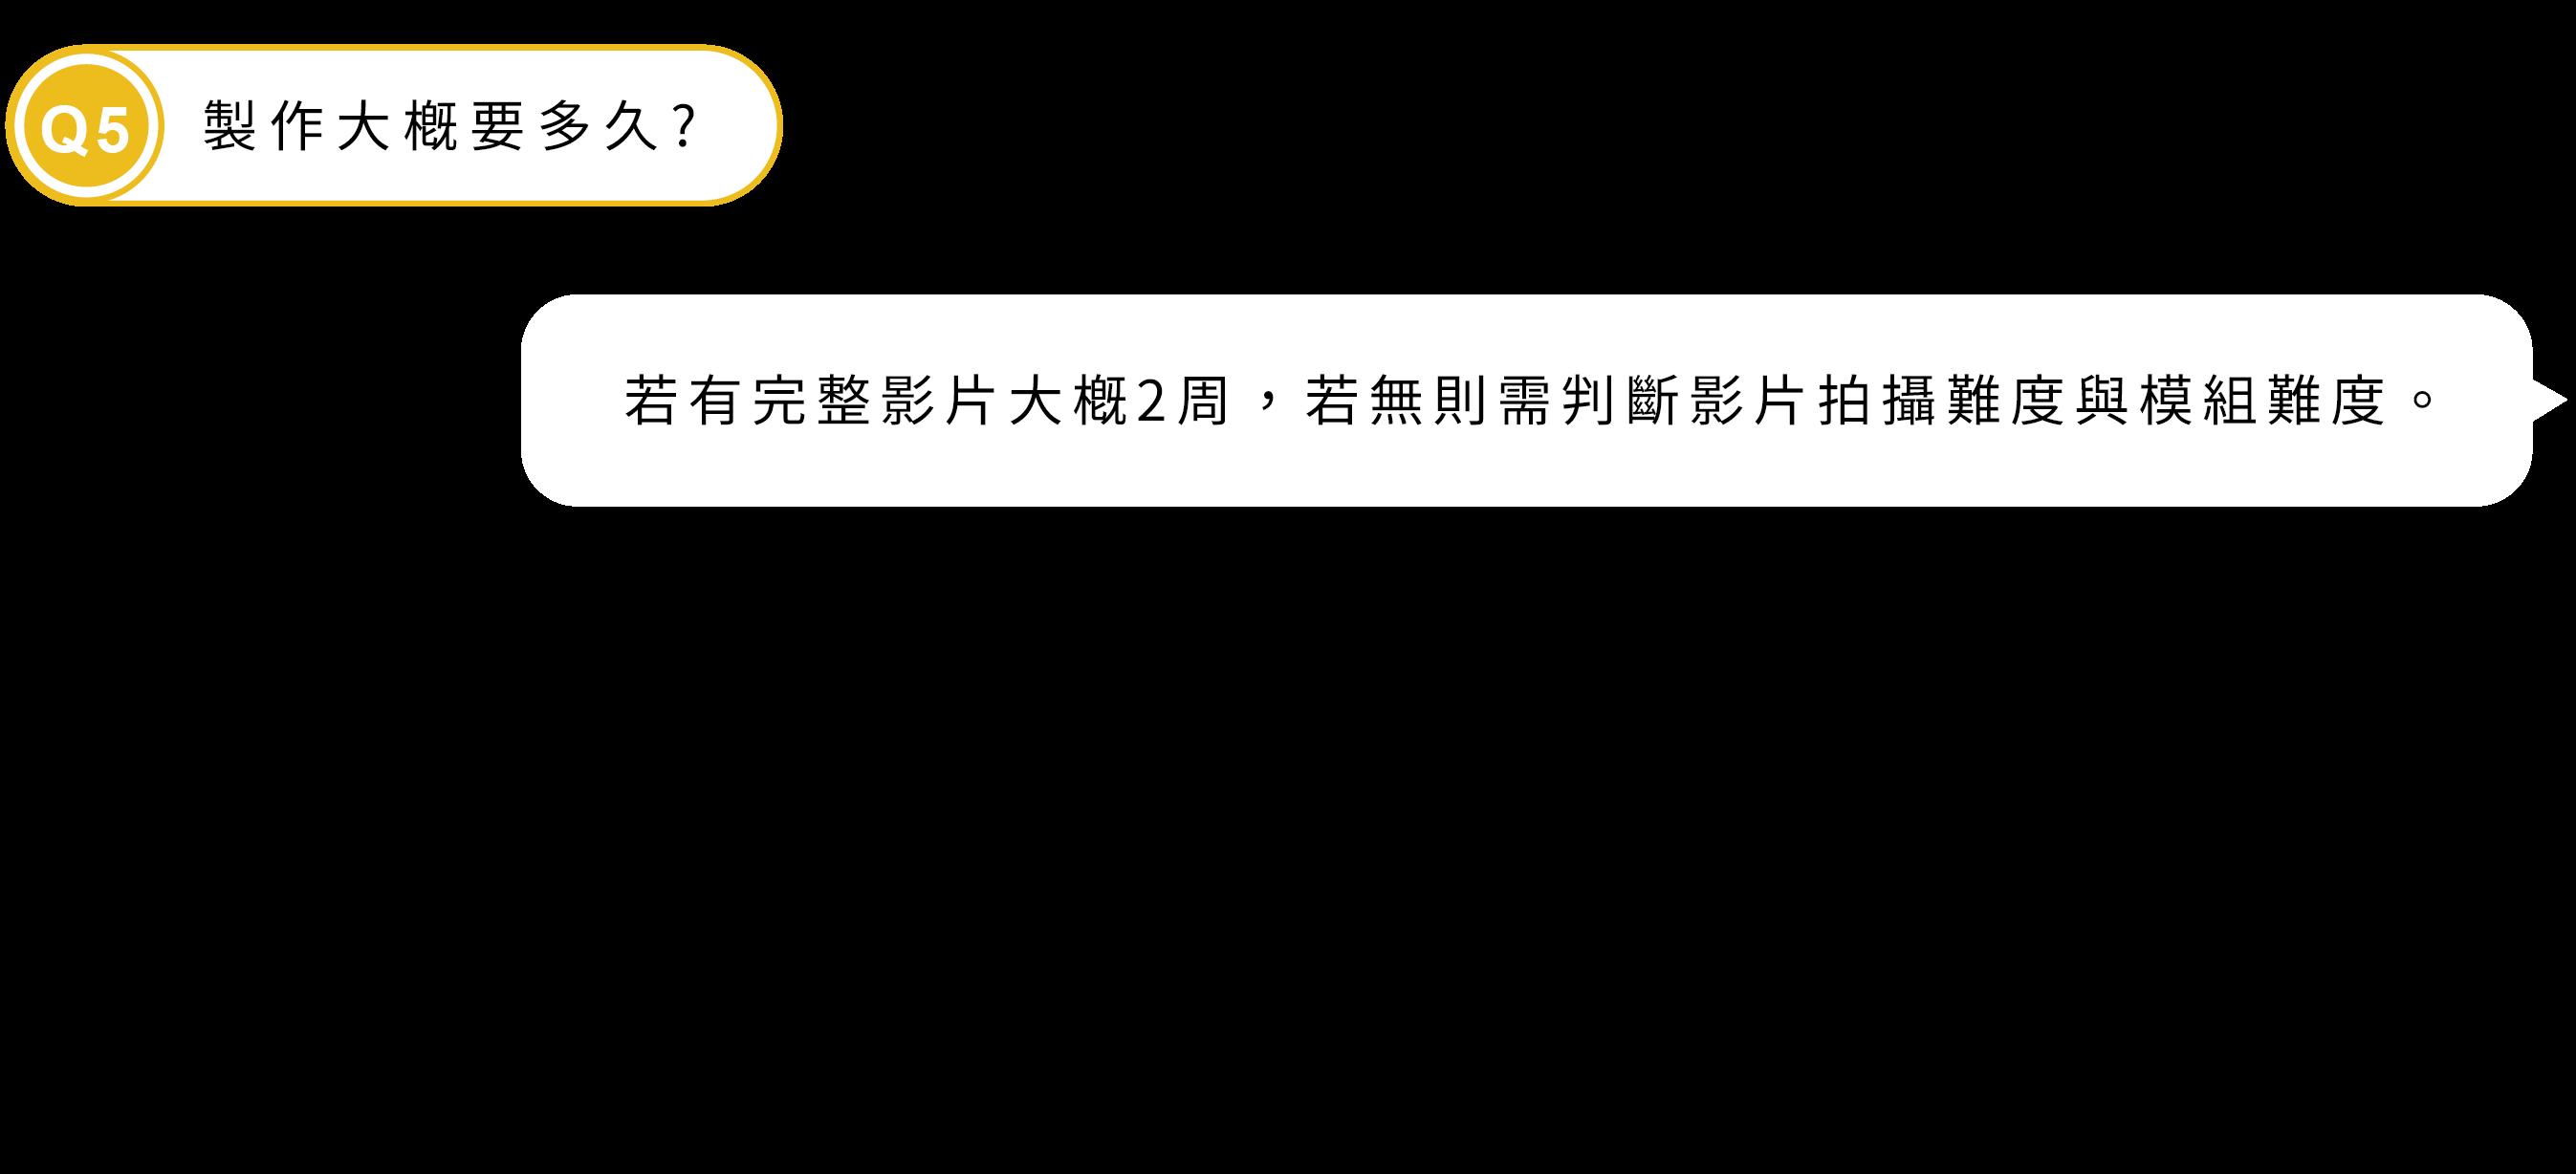 Q5-12 (1)